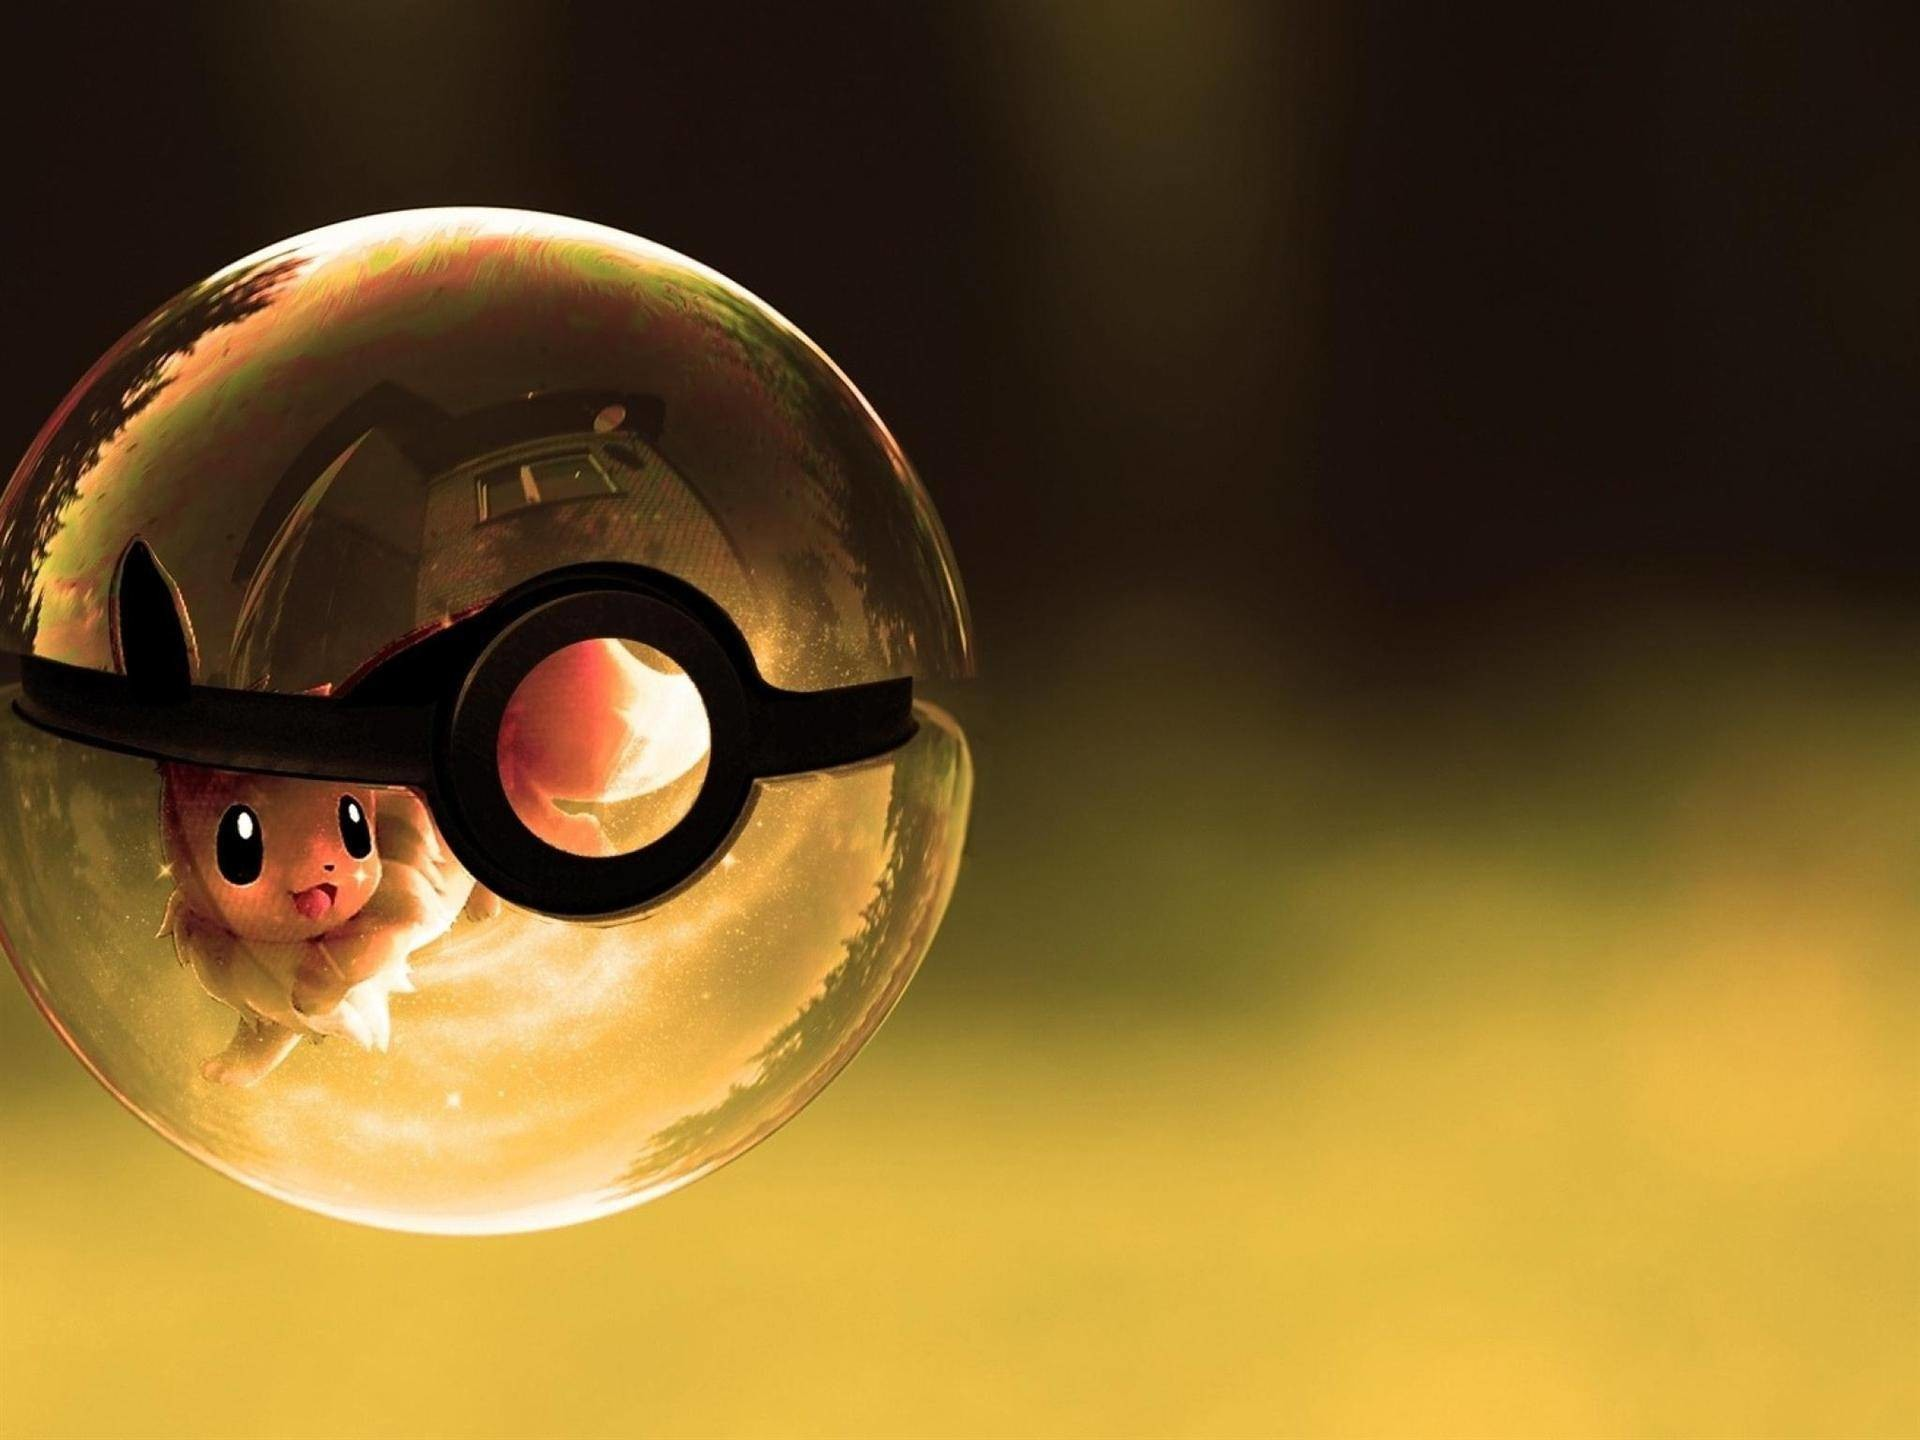 cute pokemon wallpaper – Google Search